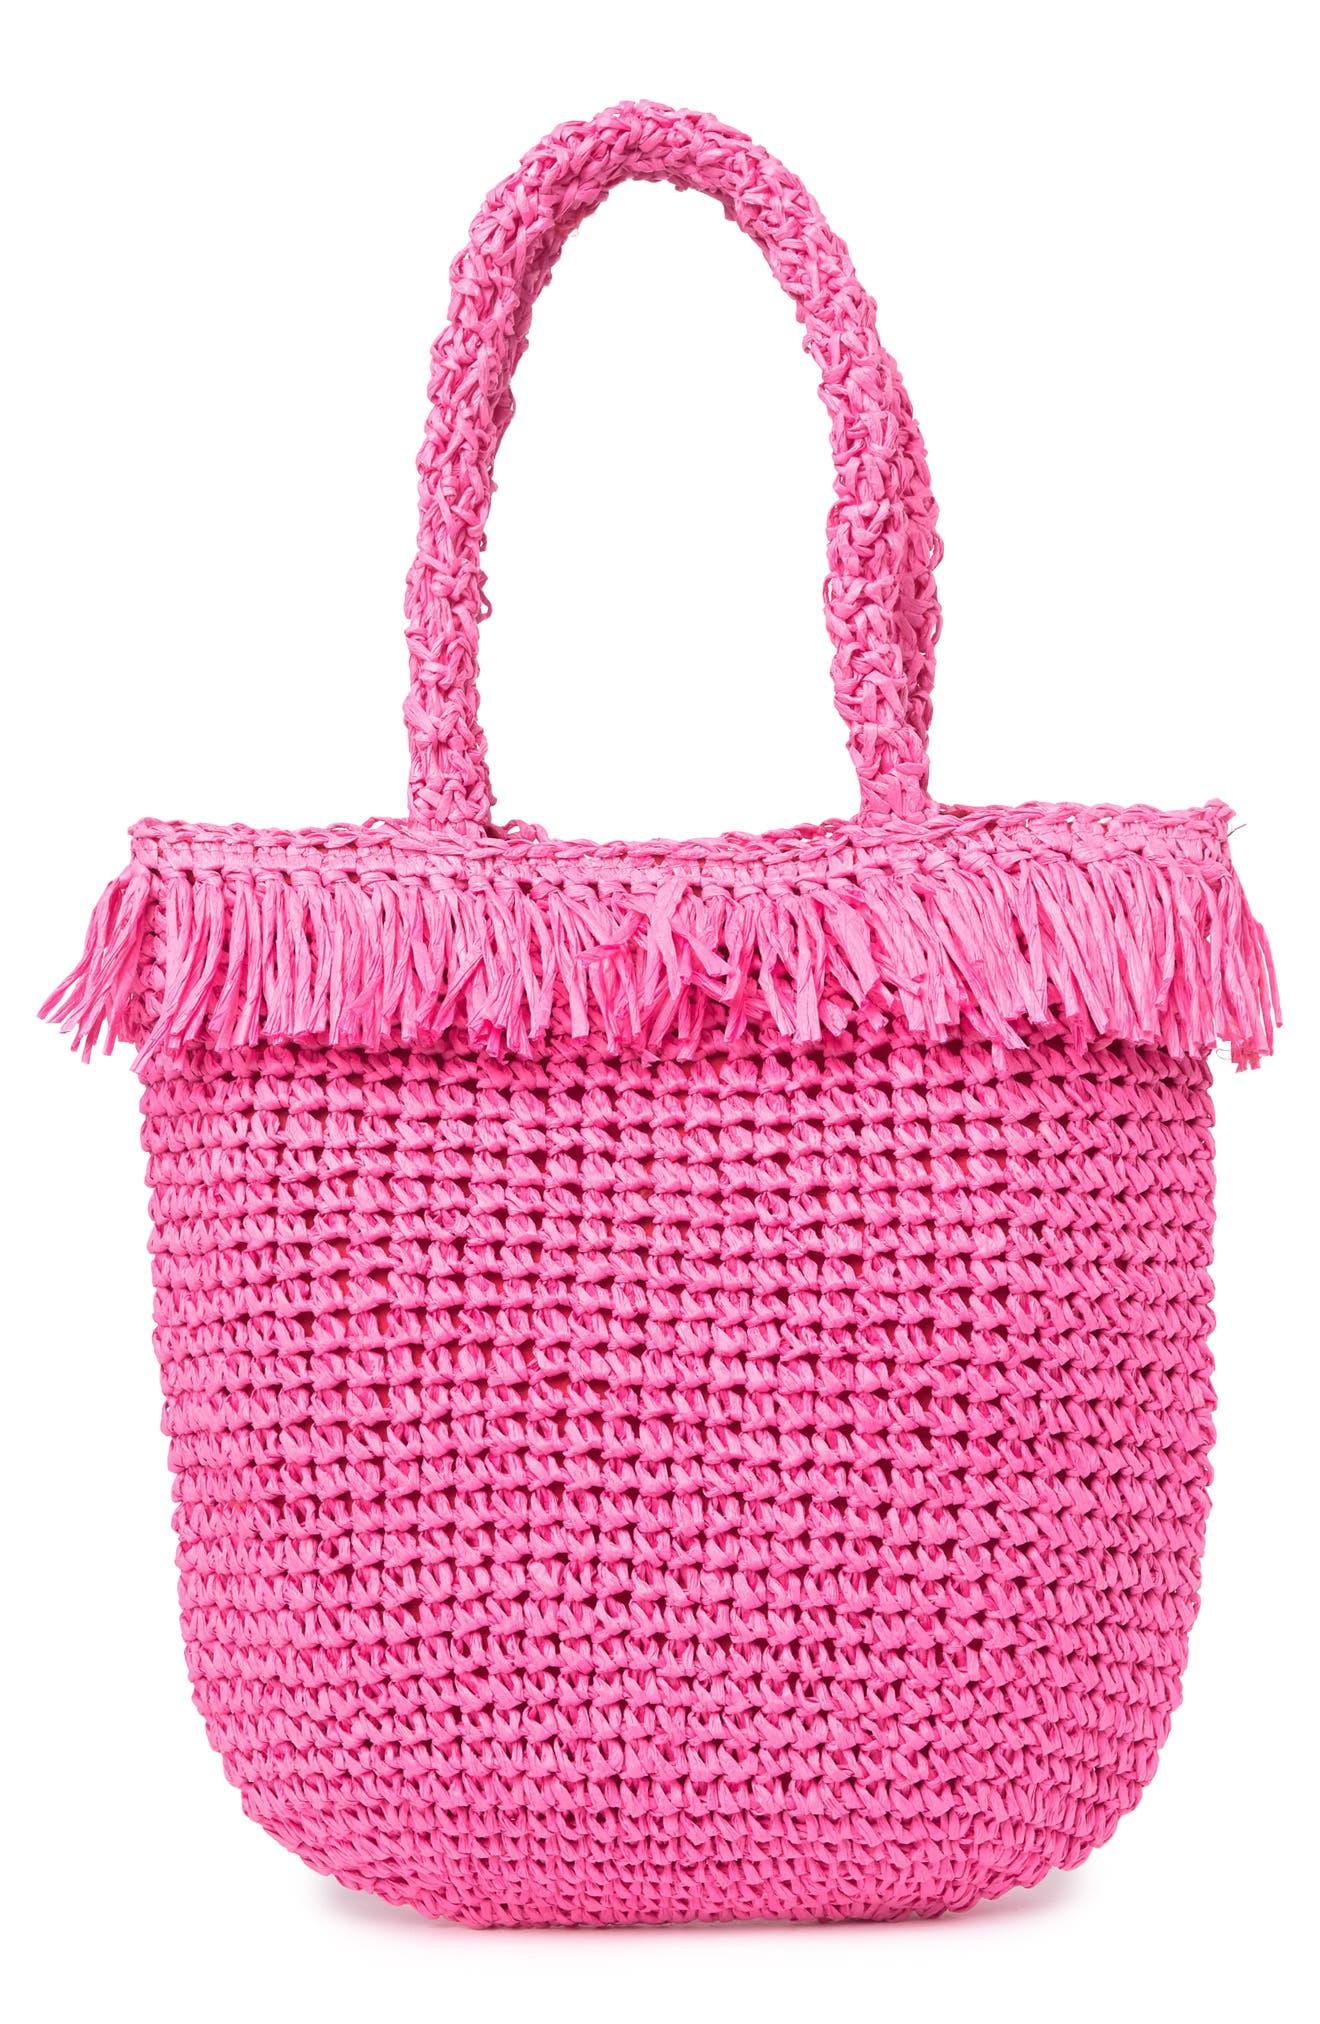 Image of Melrose and Market Palmer Straw Tote Bag